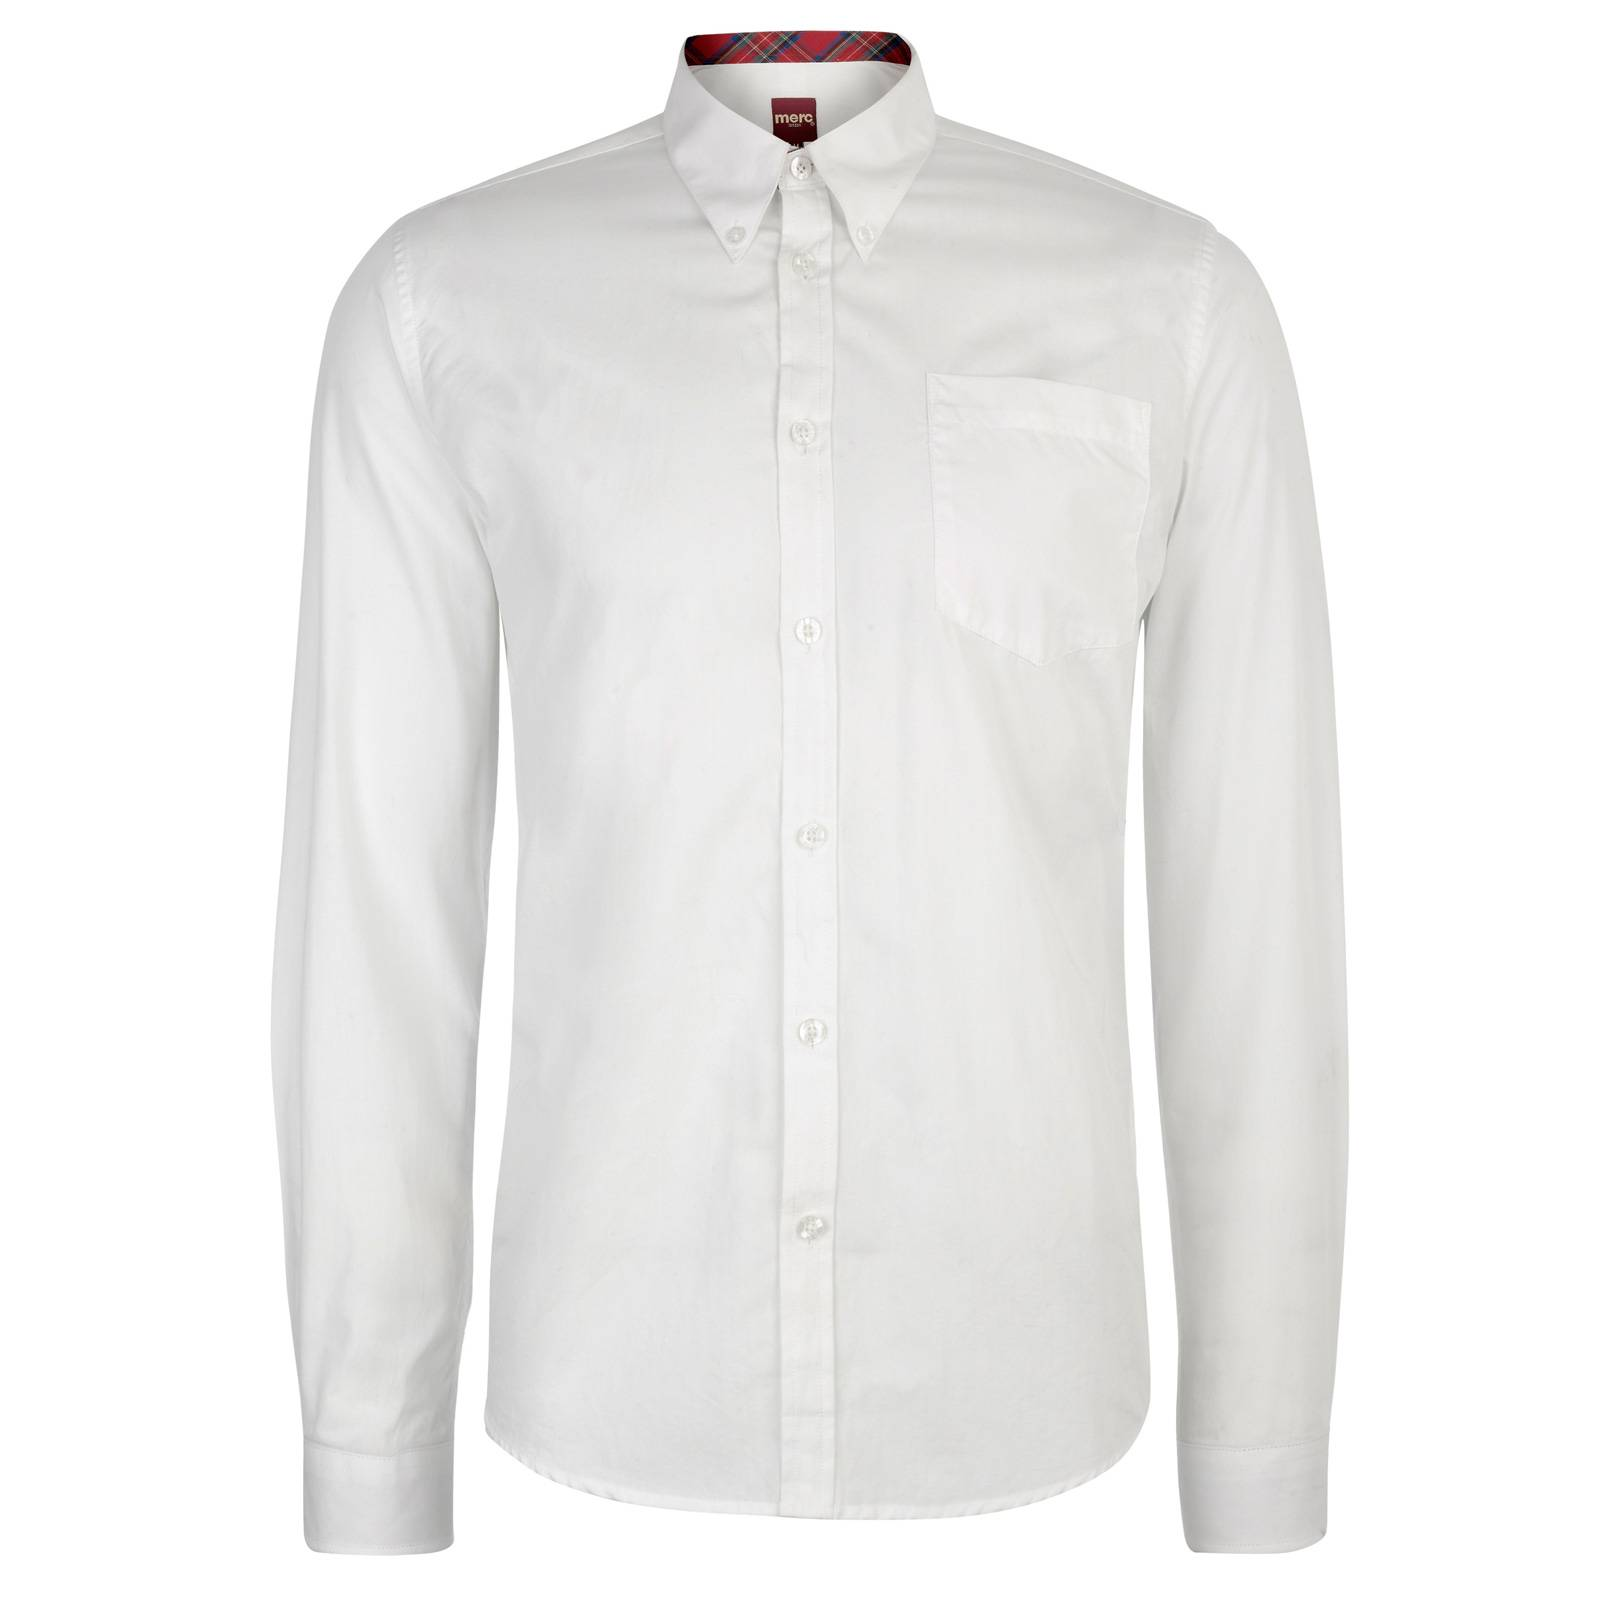 Рубашка AlbinCORE<br><br><br>Артикул: 1506301<br>Материал: 100% хлопок<br>Цвет: белый<br>Пол: Мужской